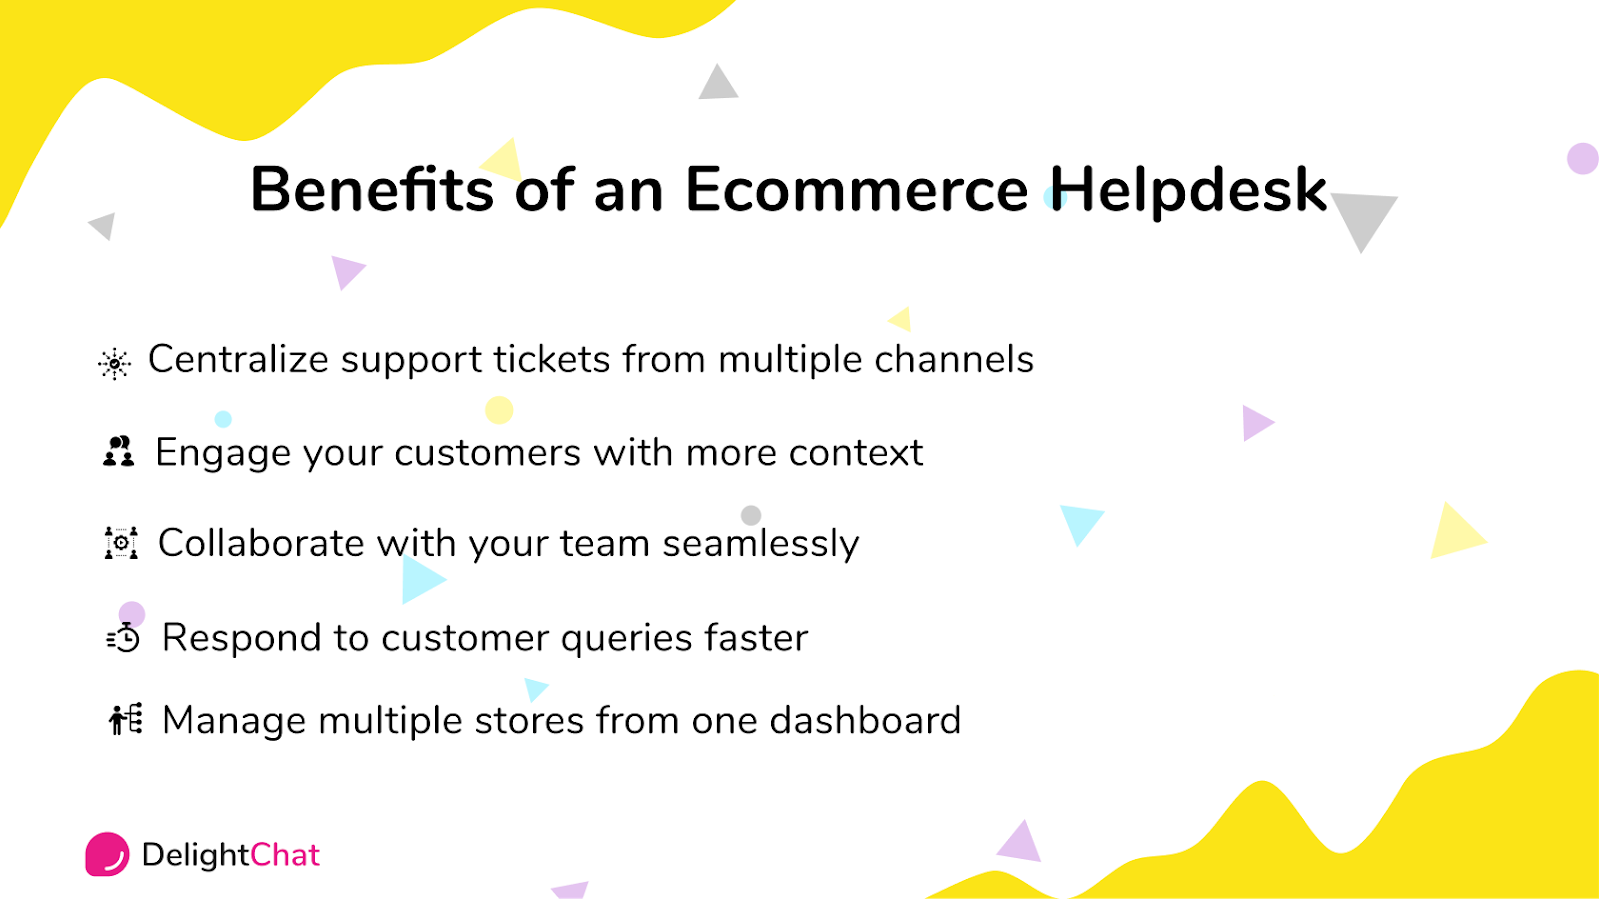 Benefits of an Ecommerce Helpdesk